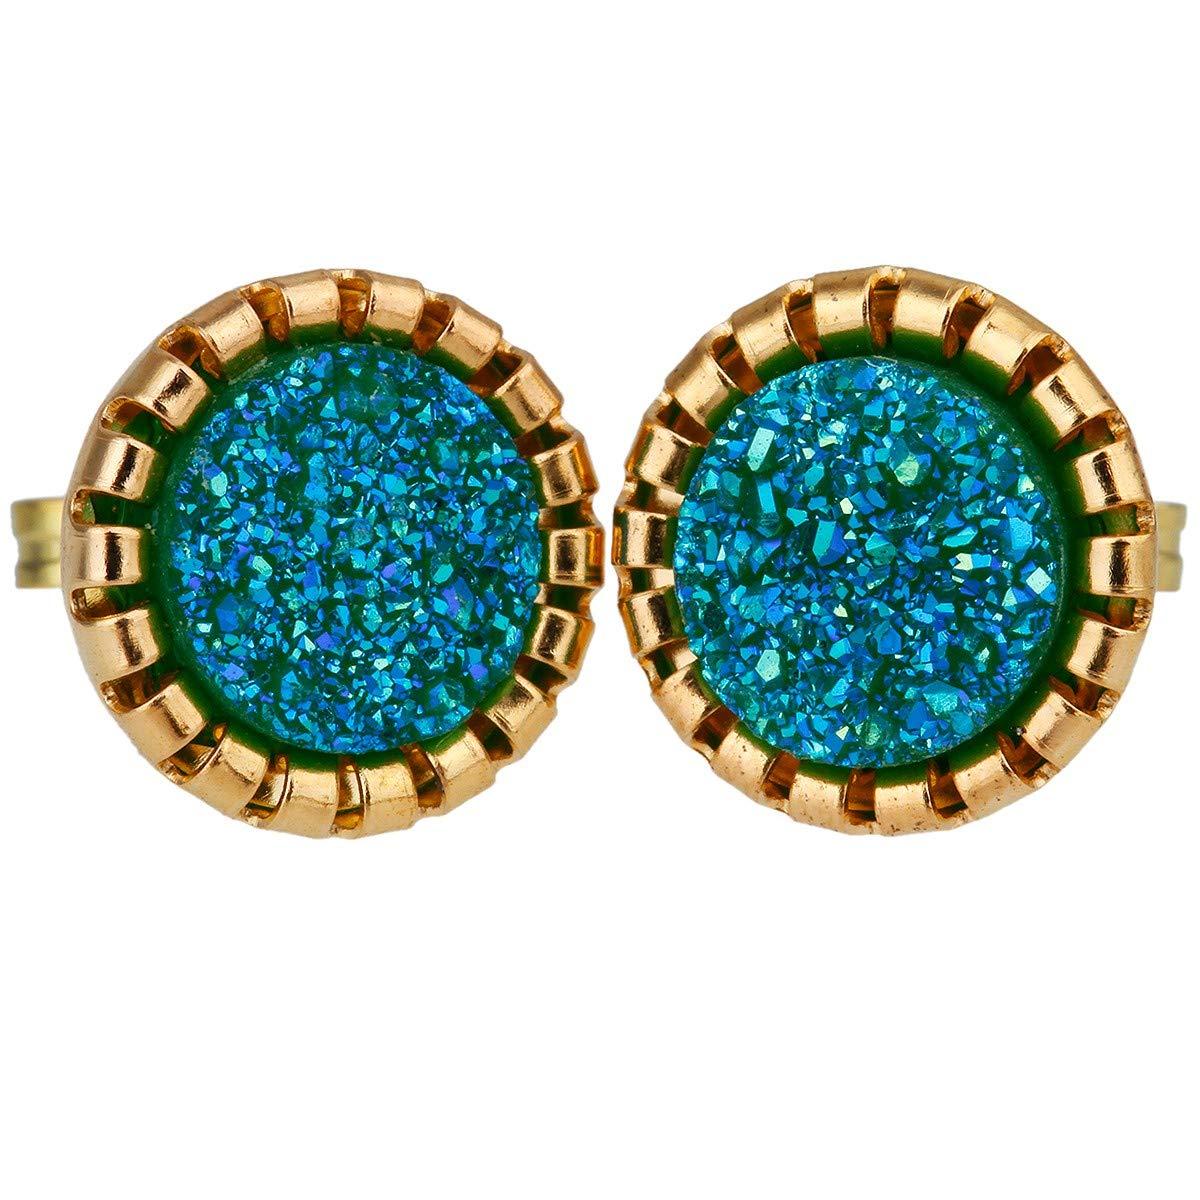 SUNYIK Womens Natural Quartz Geode Druzy Stud Earrings,Earrings for Women